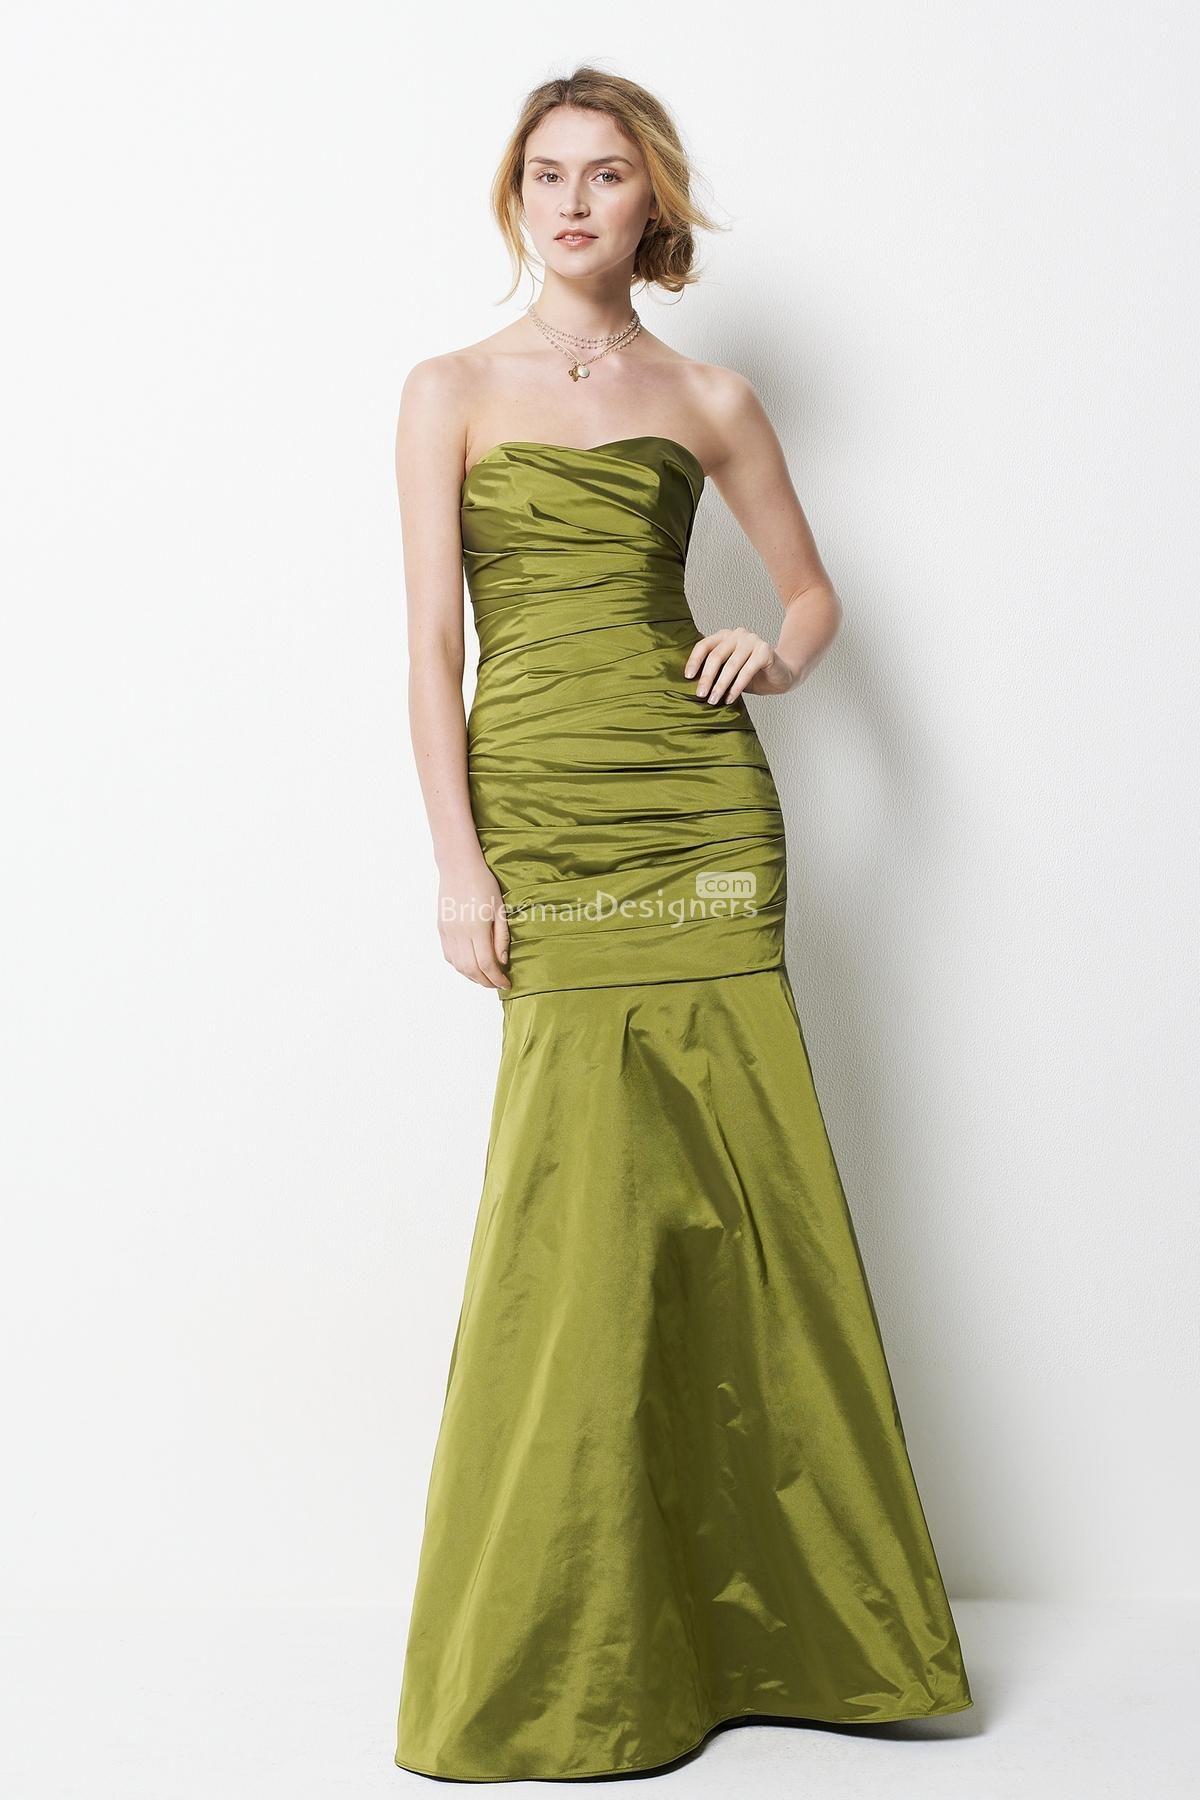 Strapless aline taffeta floor length pleated bridesmaid dress